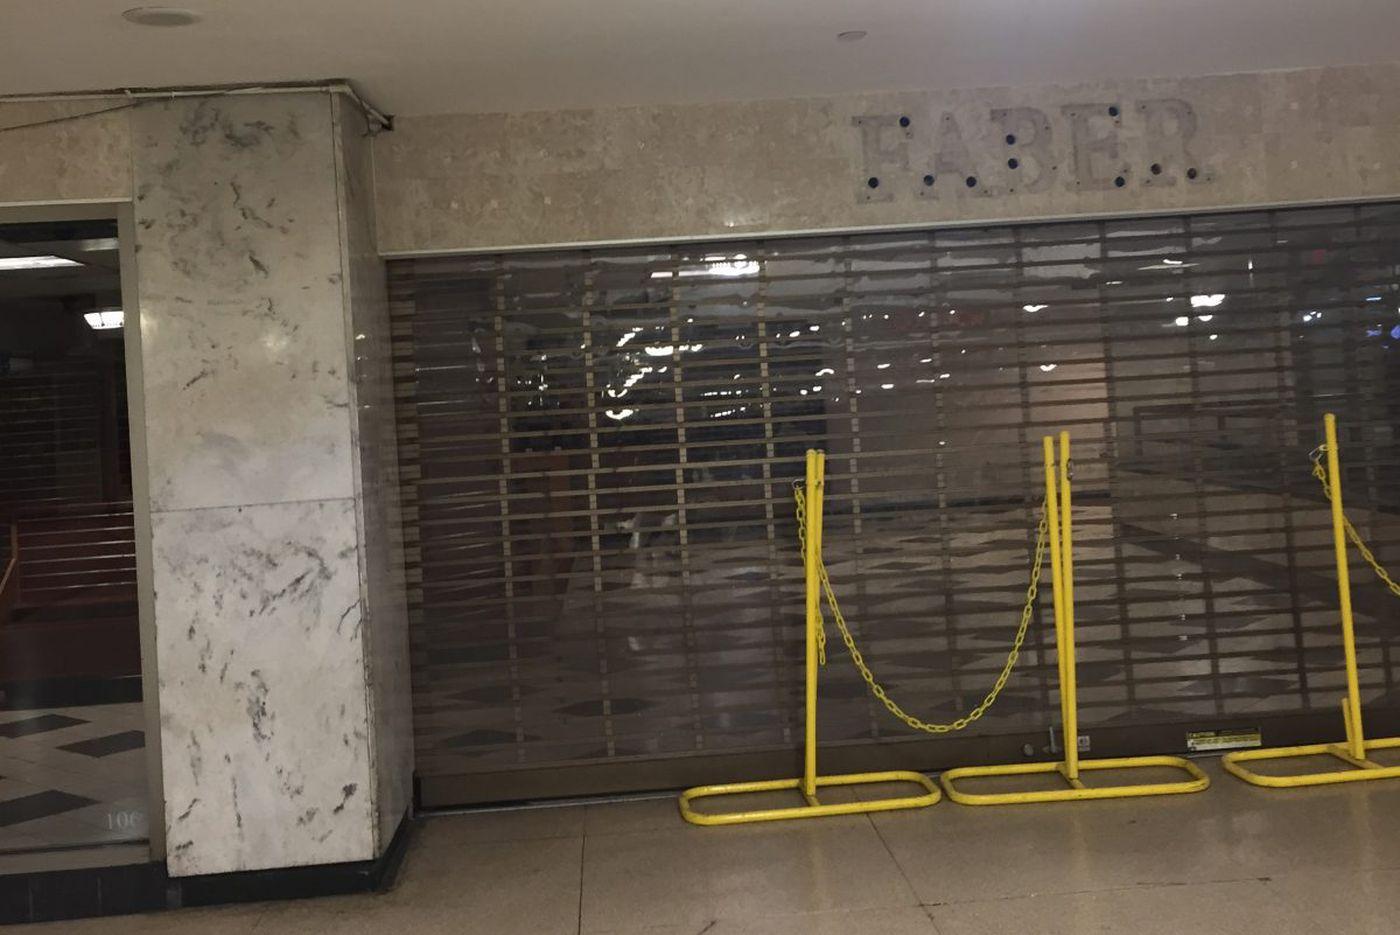 Newsstands shut in Philly Suburban Station - update